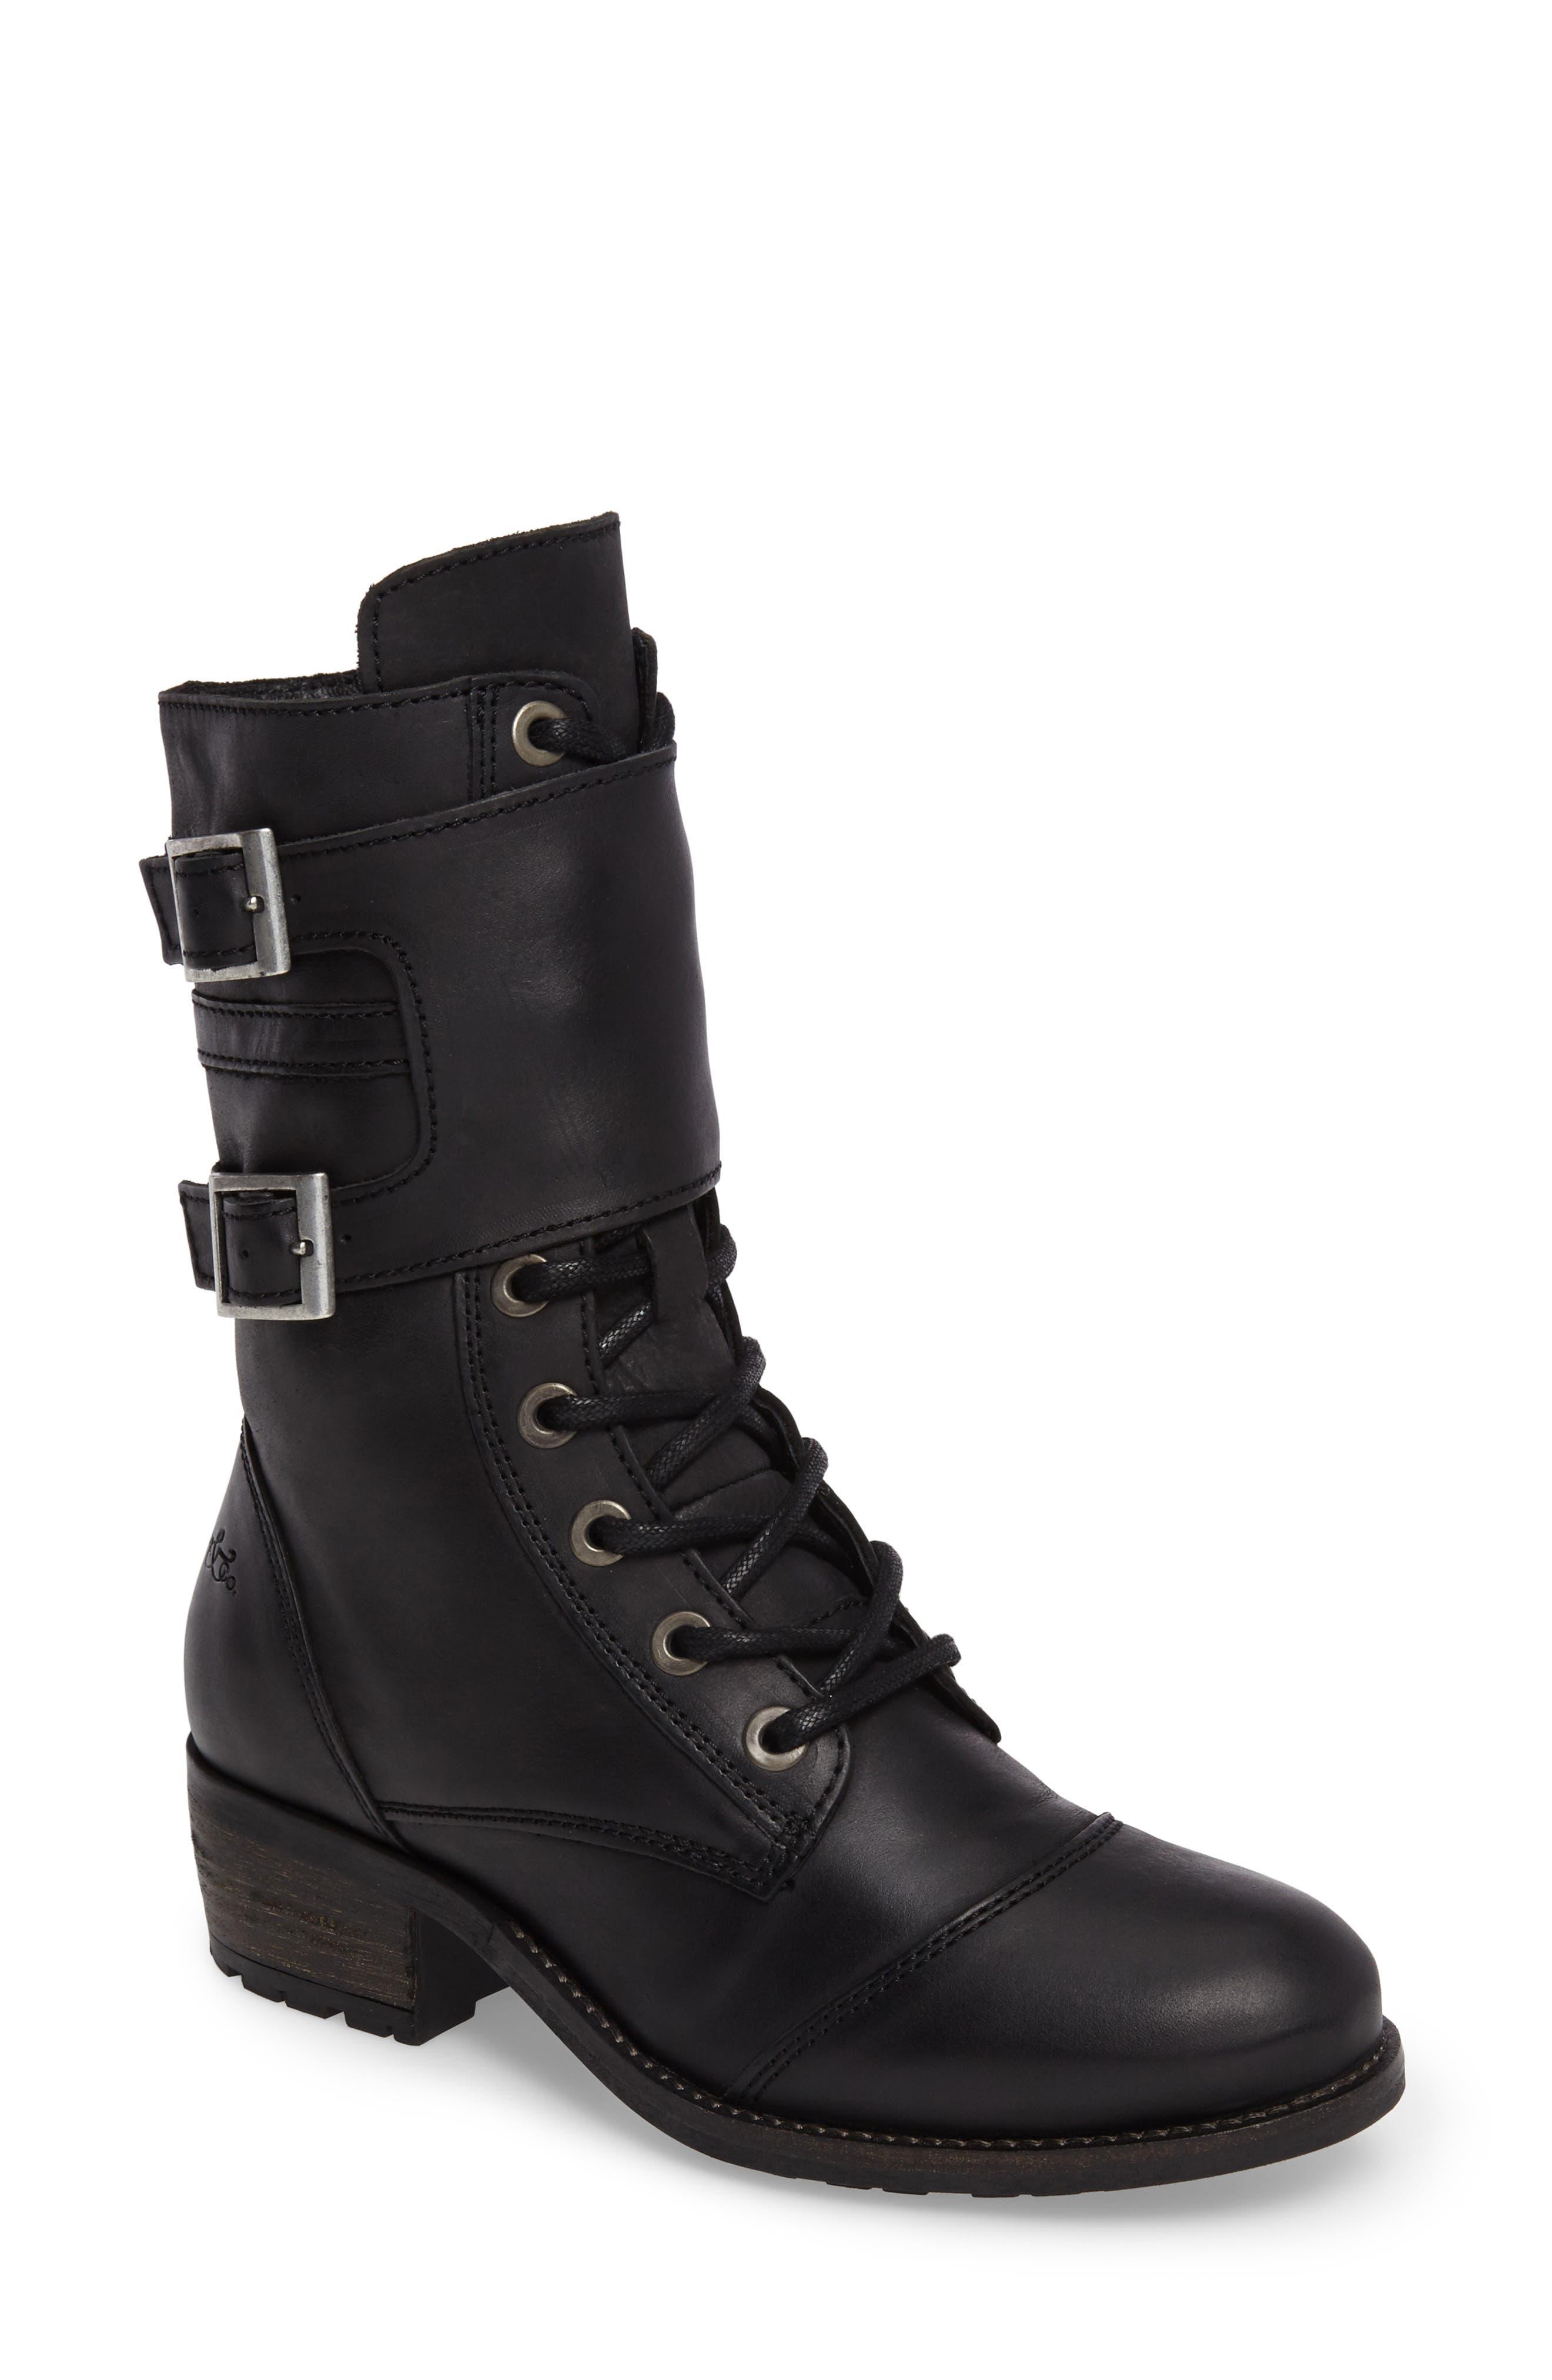 Alternate Image 1 Selected - Bos. & Co. Lune Waterproof Moto Boot (Women)